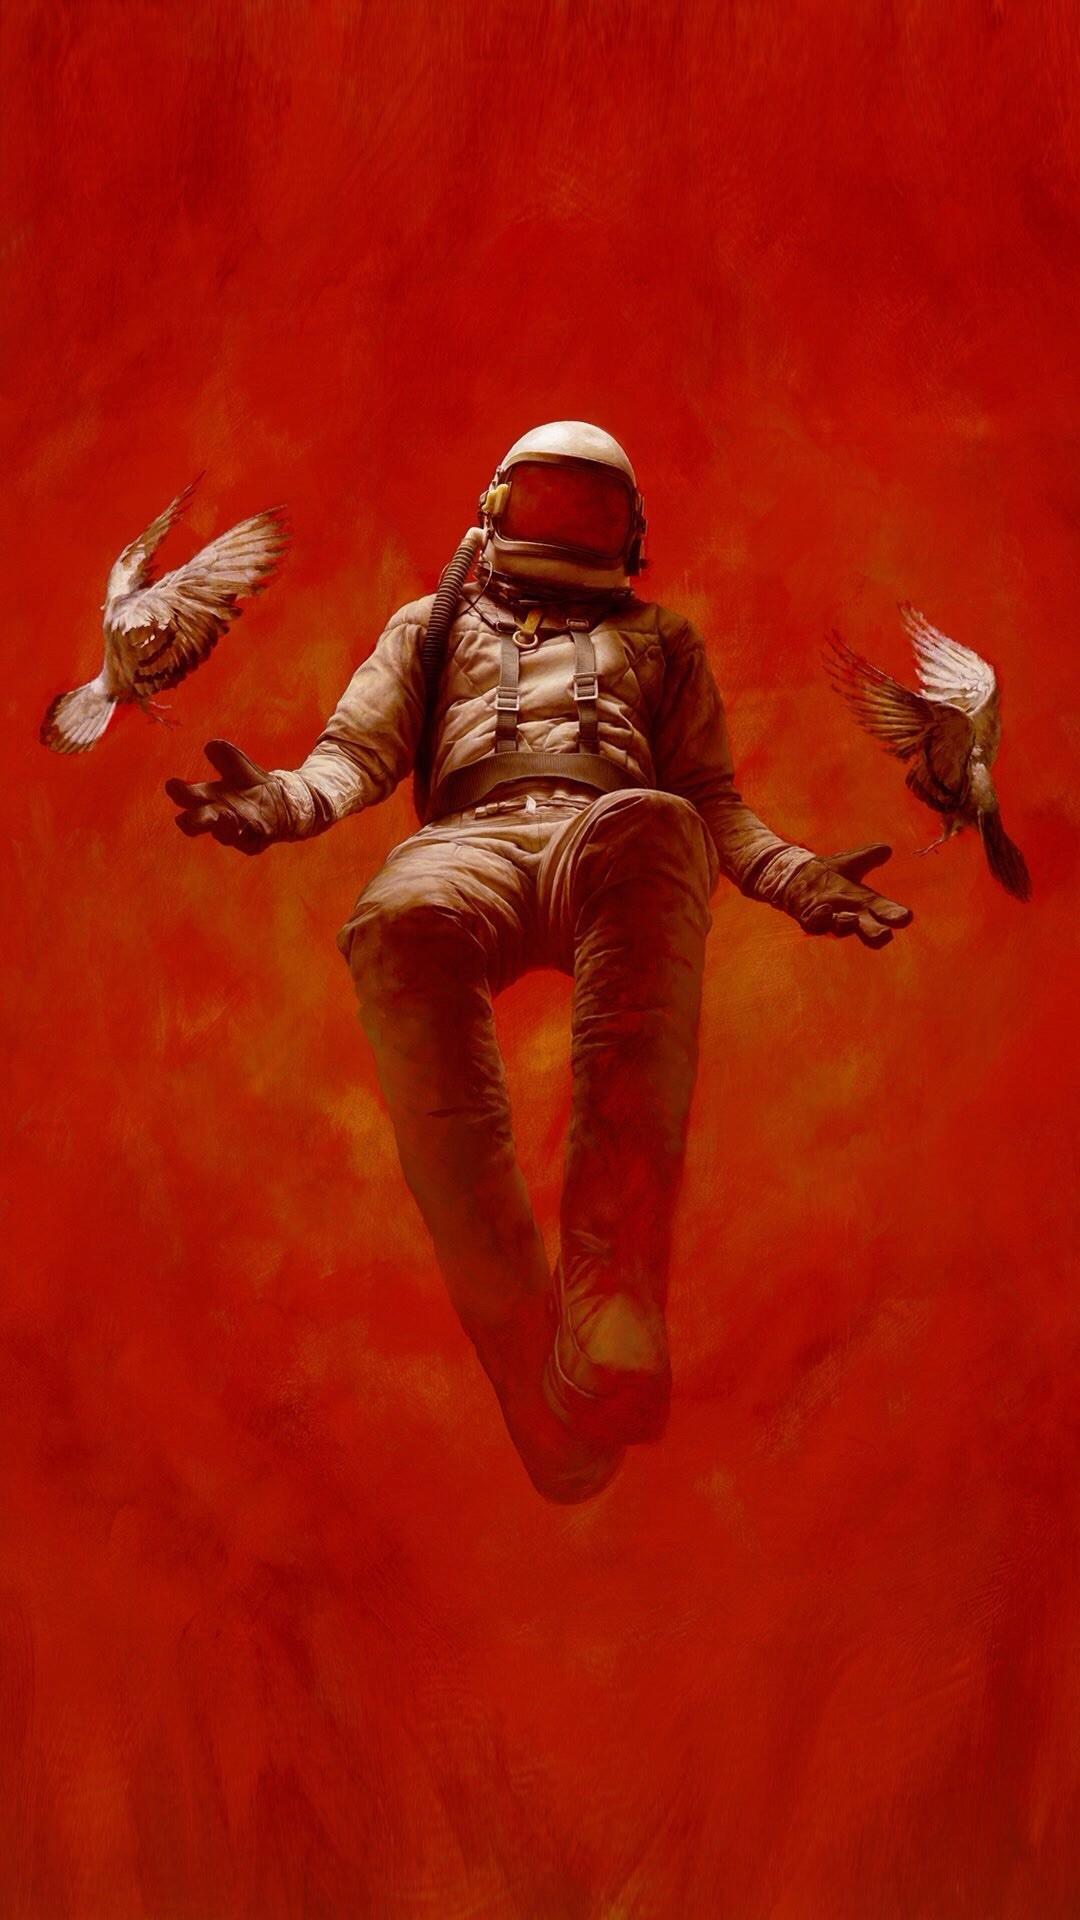 General 1080x1920 digital art portrait display simple background minimalism astronaut birds flying helmet spacesuit dove fire red background gloves artwork